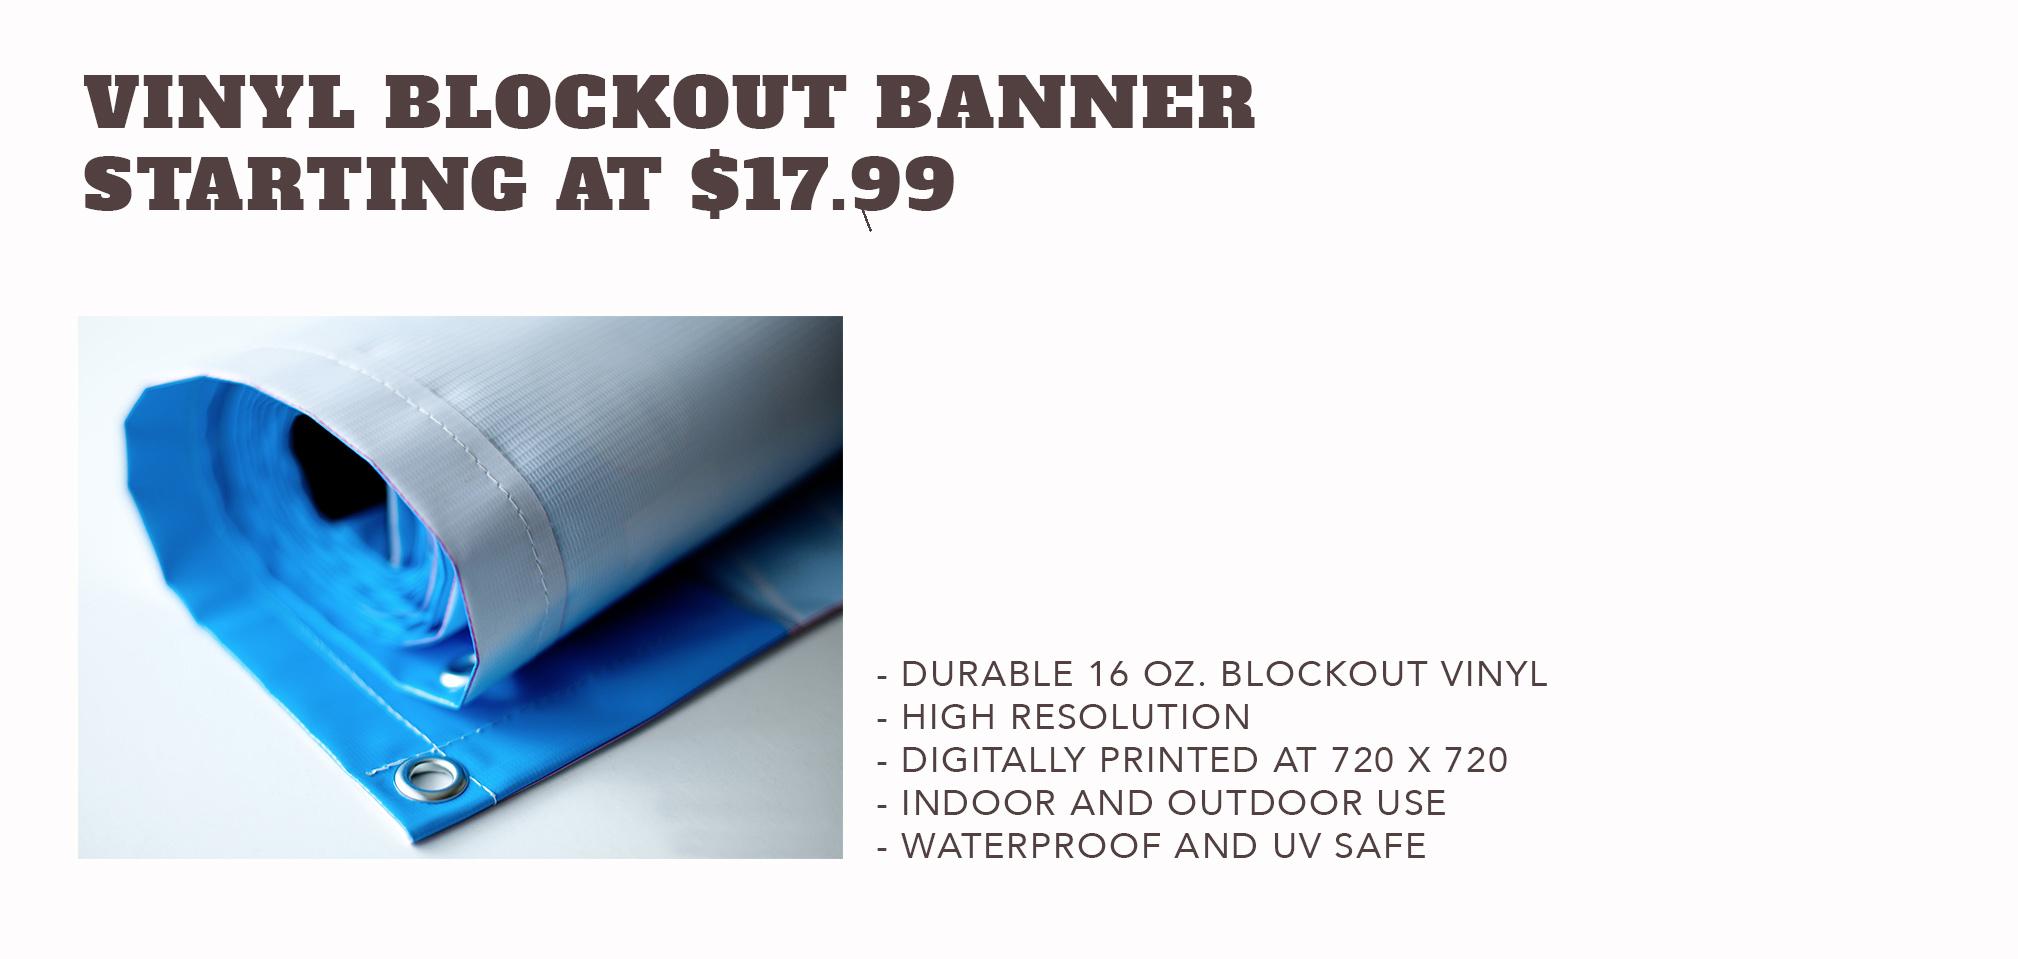 16 oz. VinylBlockout Banners - Starting at $17.99